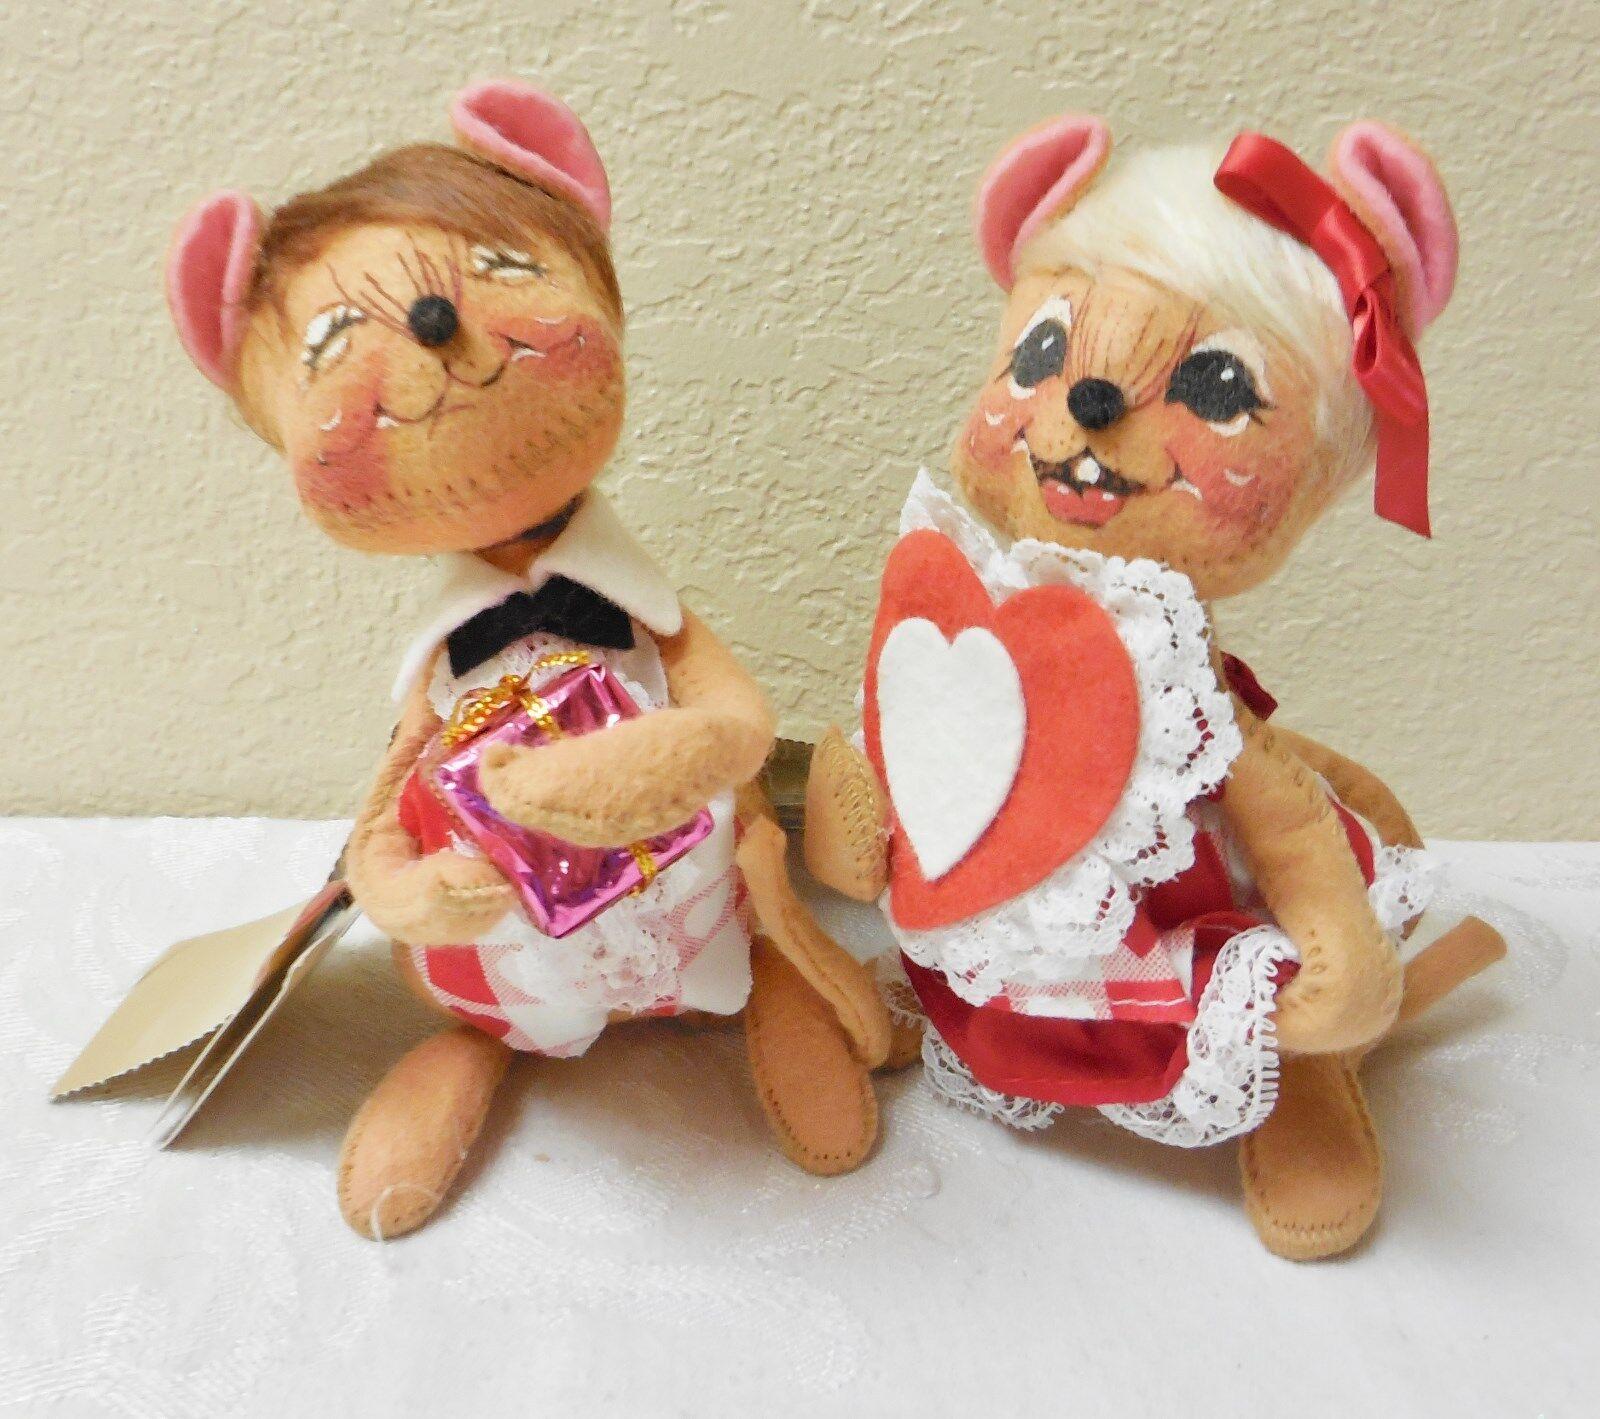 Nmwt  vintage1997annalee 7    cariño boy&girl Mouse  Estatuilla & 034097